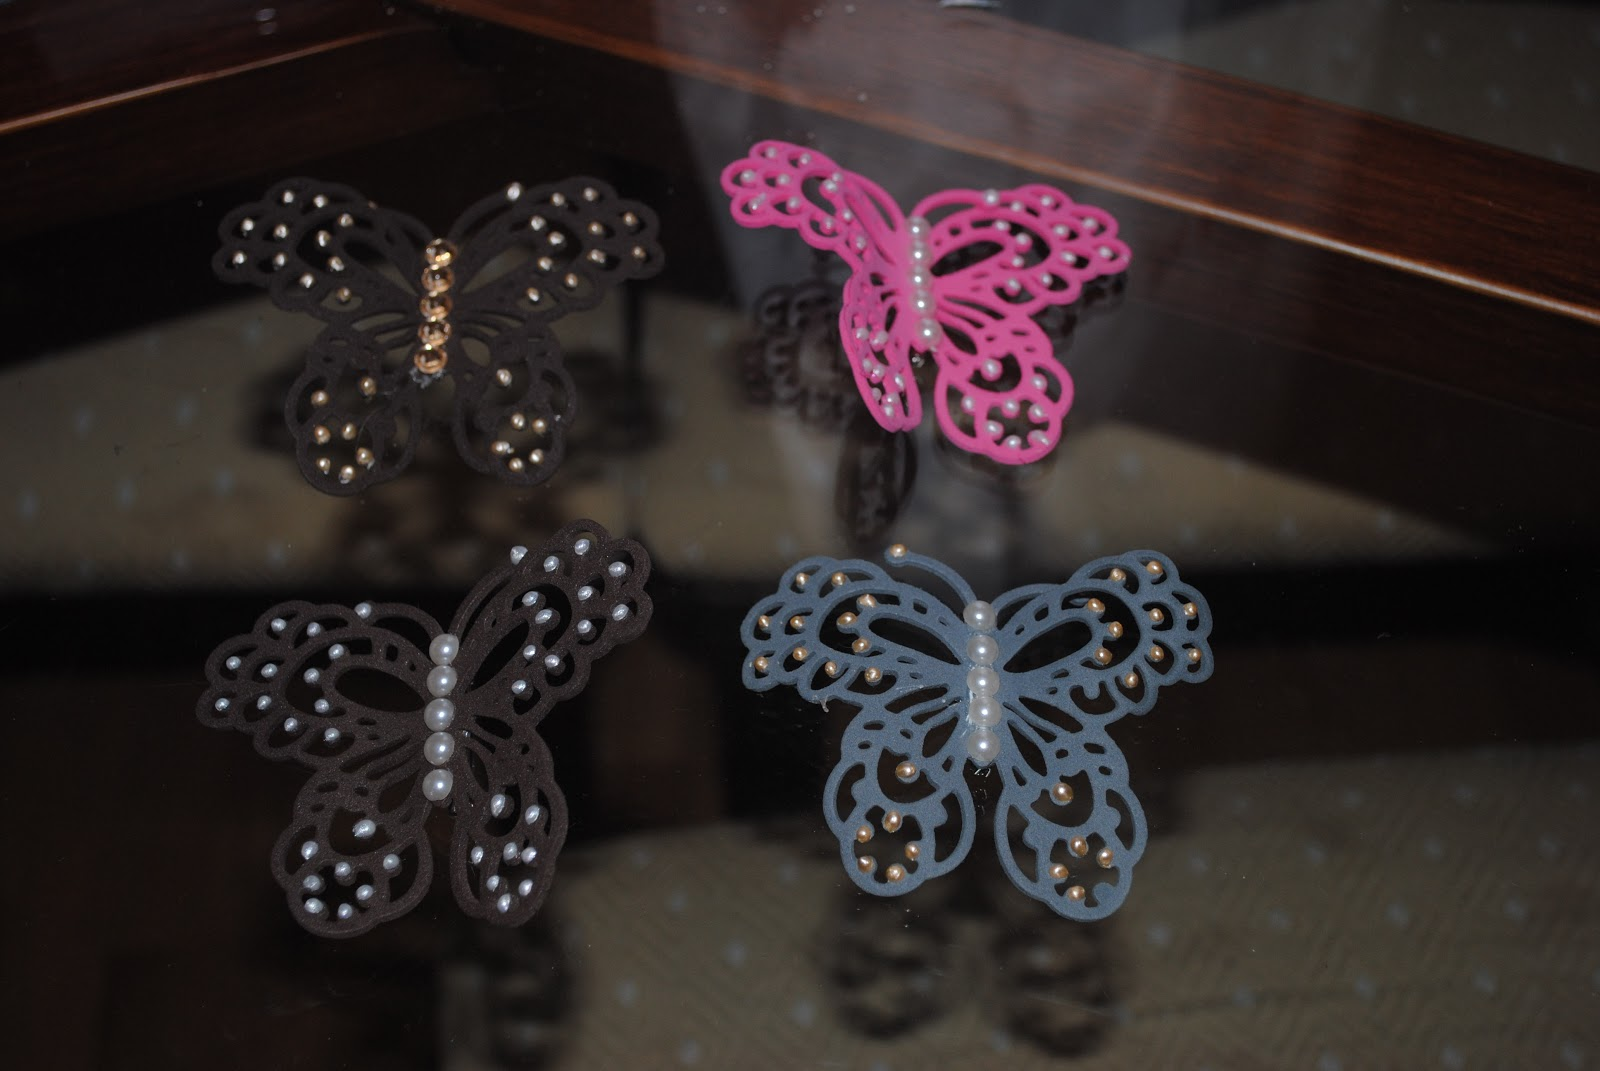 Regalos goma eva broches mariposas - Mariposas goma eva ...